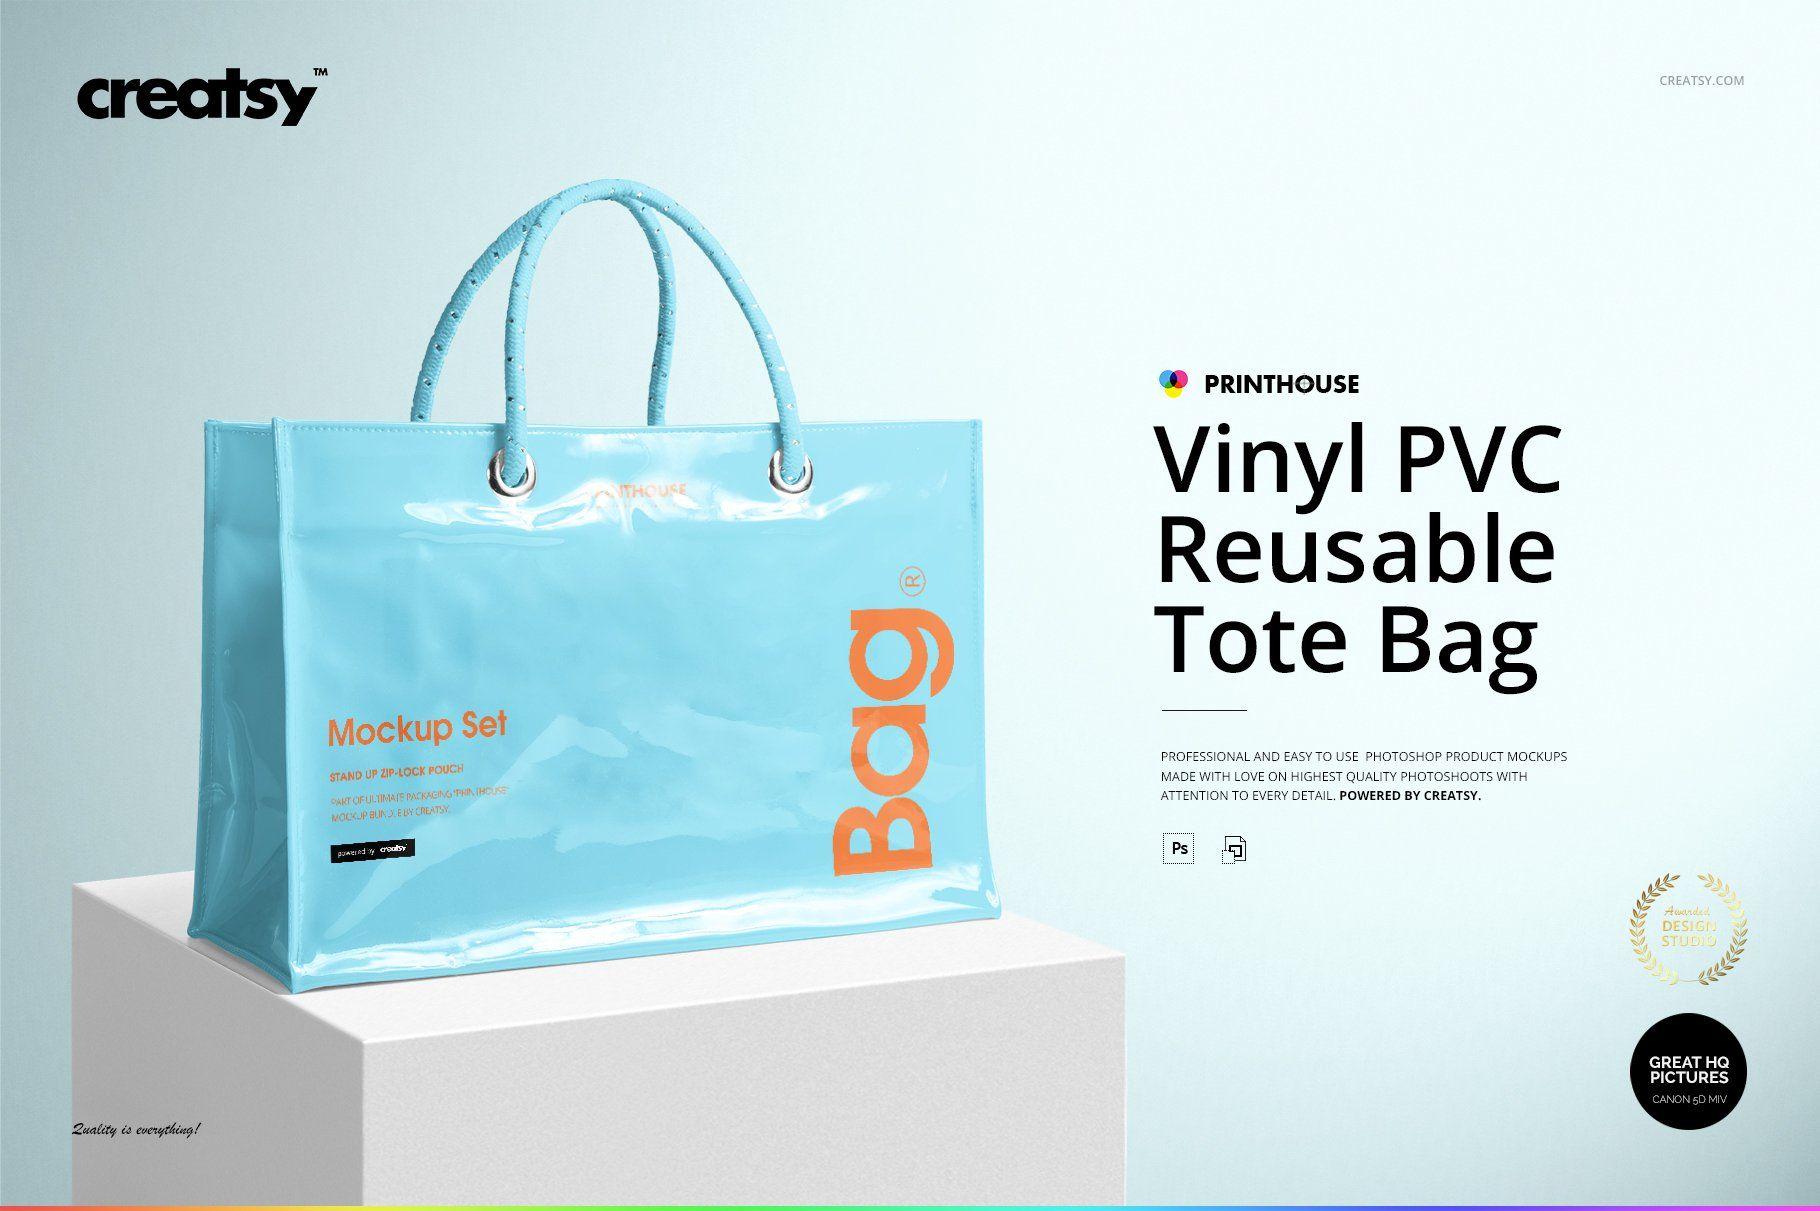 Download Vinyl Pvc Reusable Tote Bag Mockups Bag Mockup Reusable Tote Bags Tote Bag